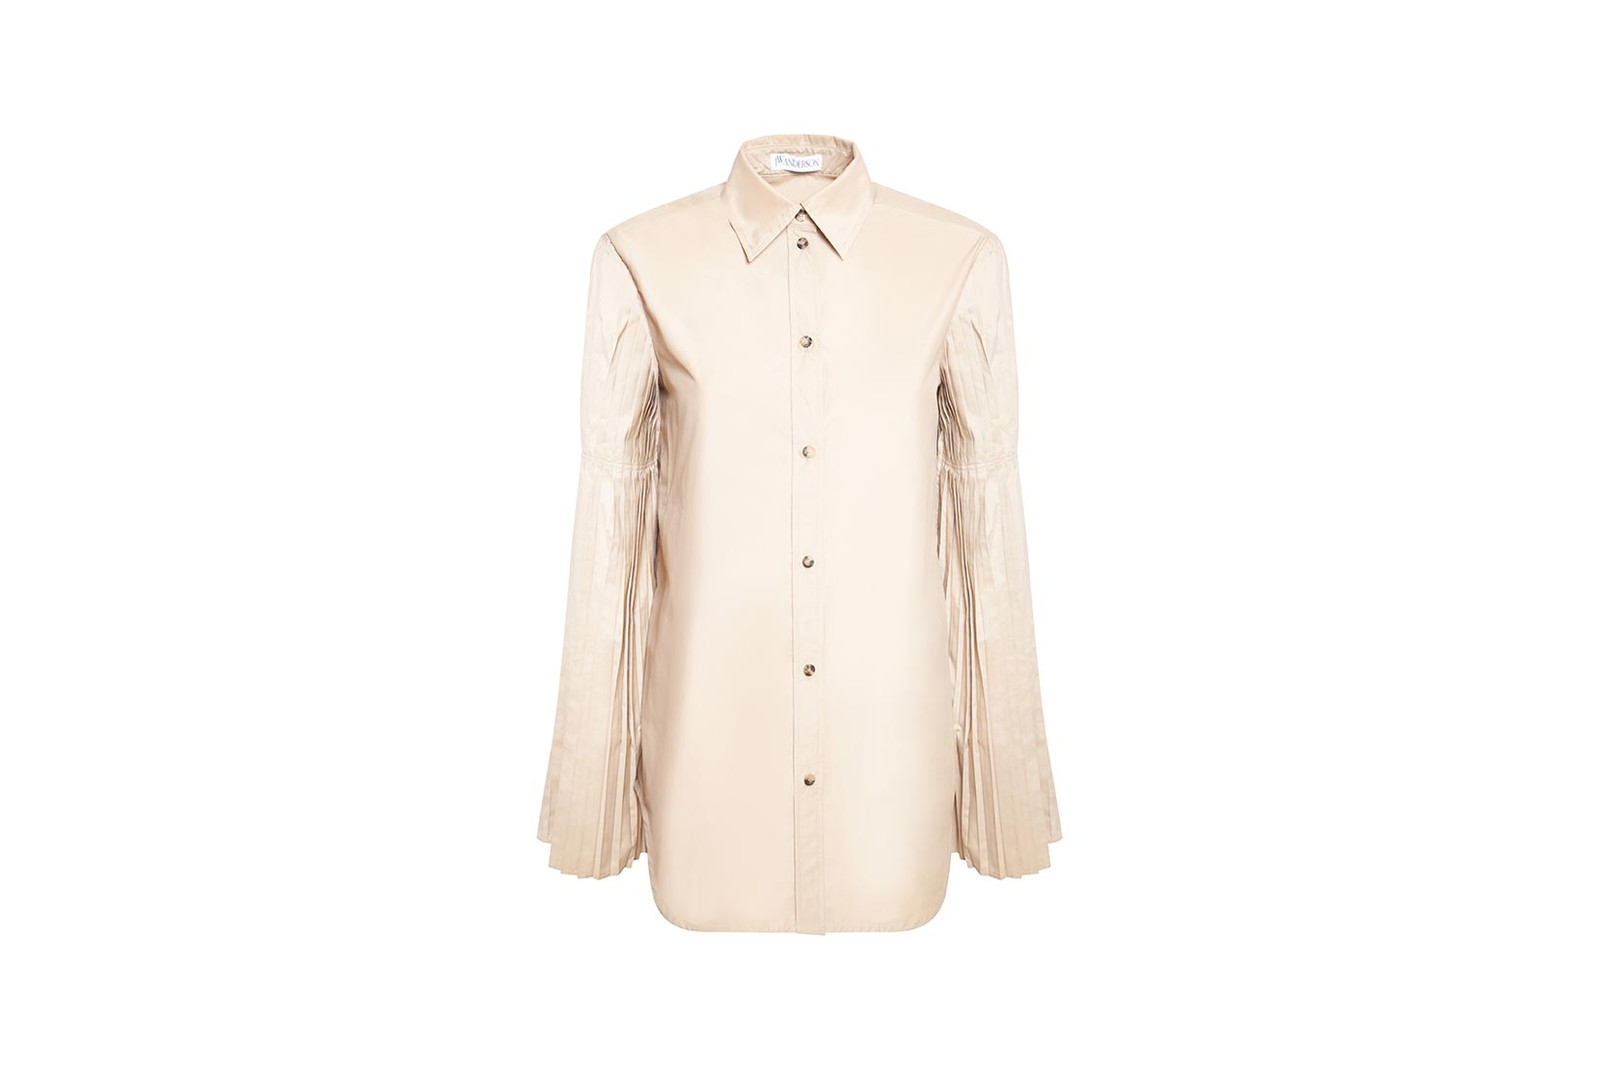 yoox jonathan jw anderson collaboration coats hoodies skirts designer bag campaign unisex